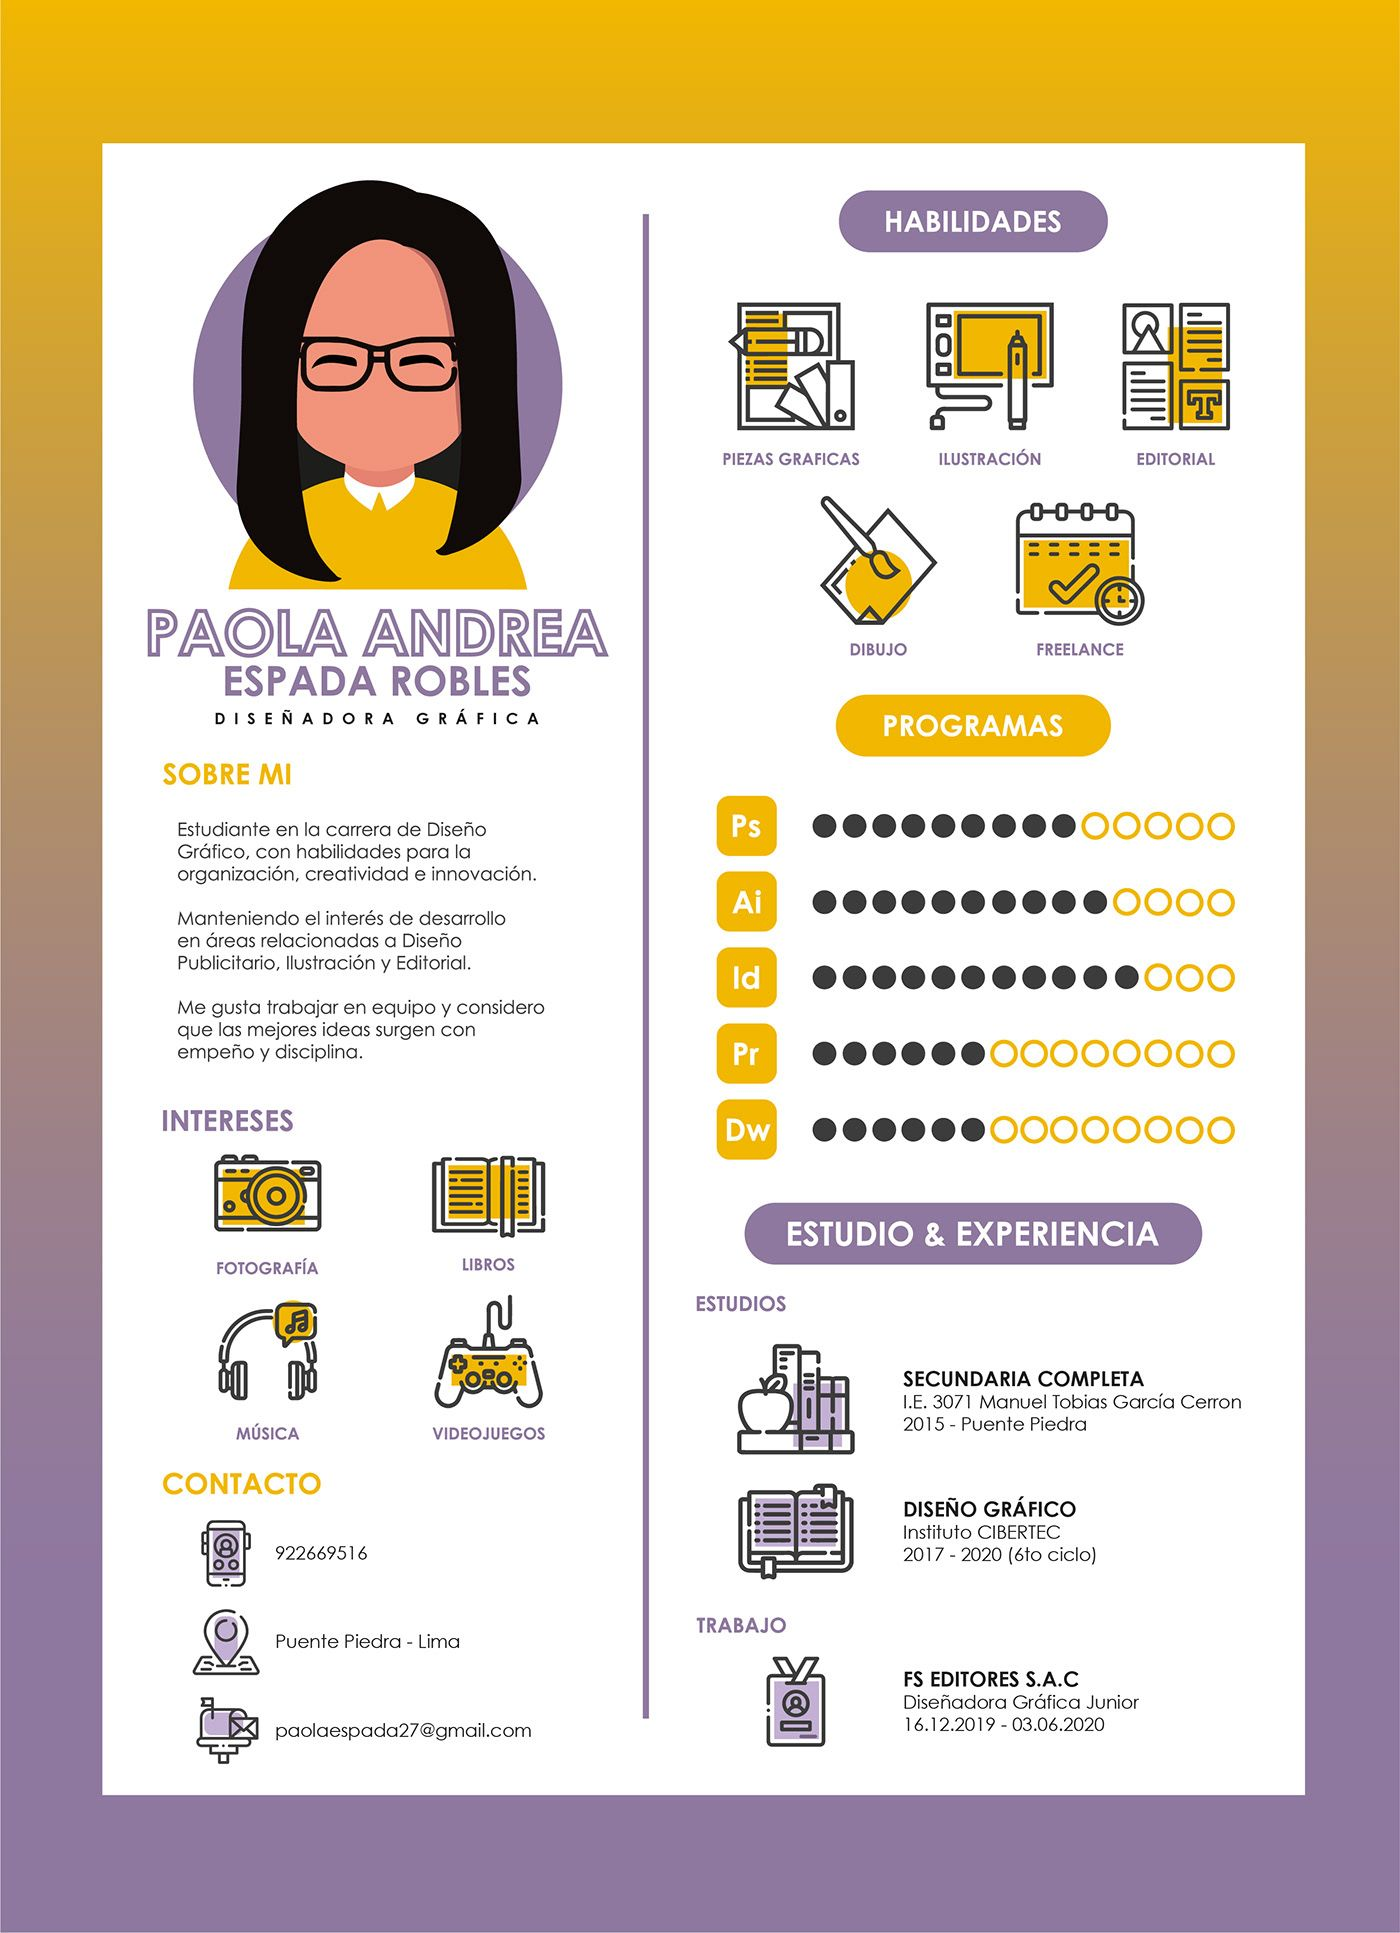 Creative Infographic Resume / CV in 2020 Graphic design